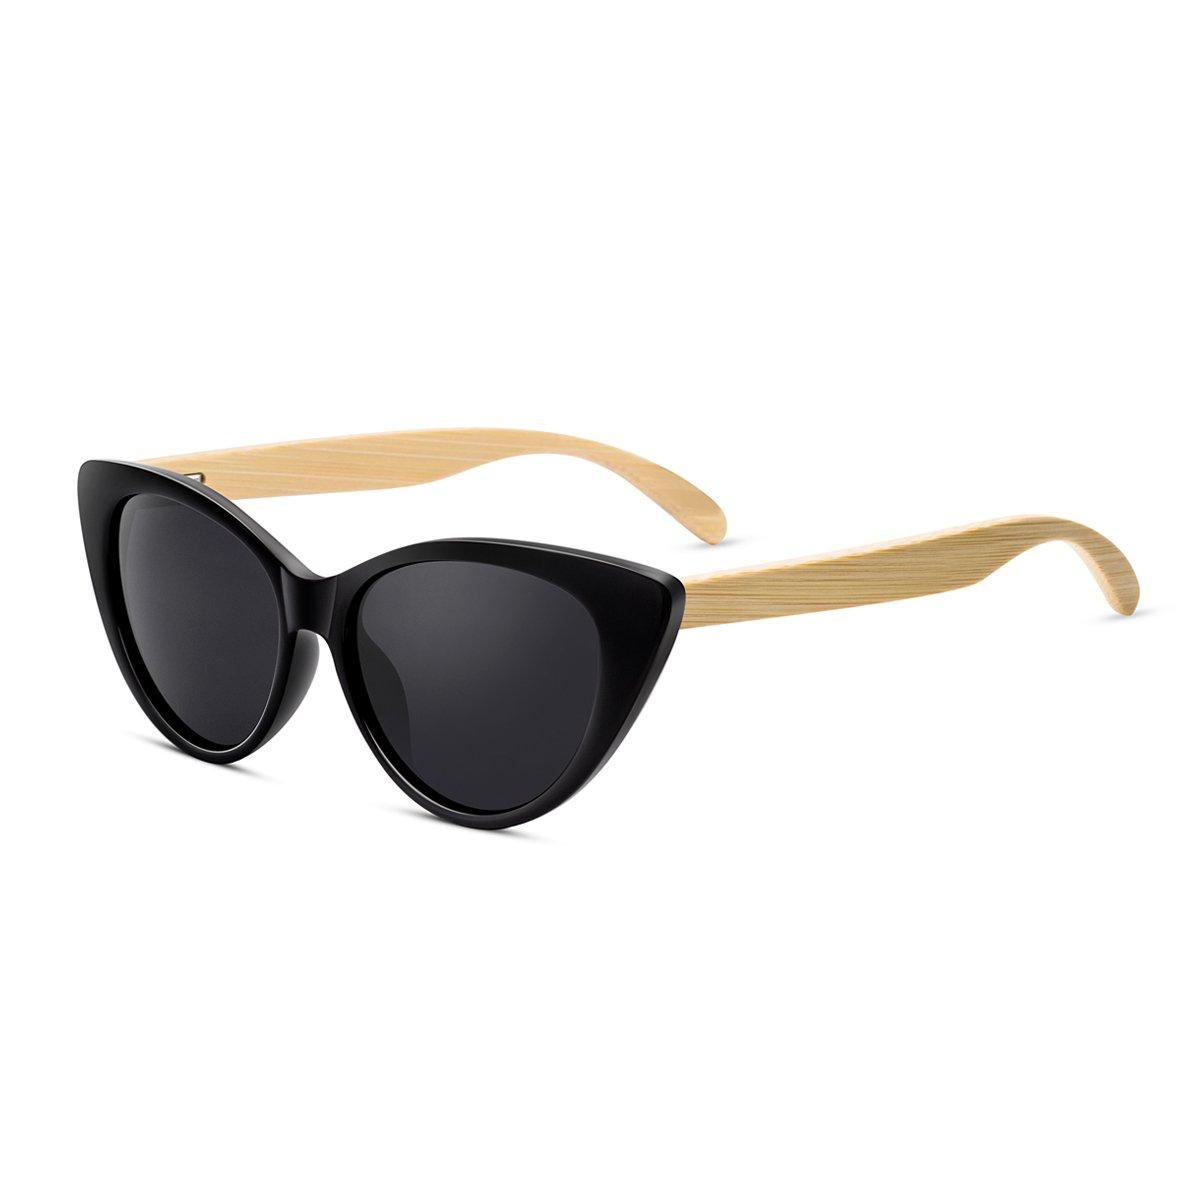 1dabee10b023 Amazon.com: WISH CLUB Cat Eye Wood Handmade Sunglasses for Women and Men  with UV 400: Clothing